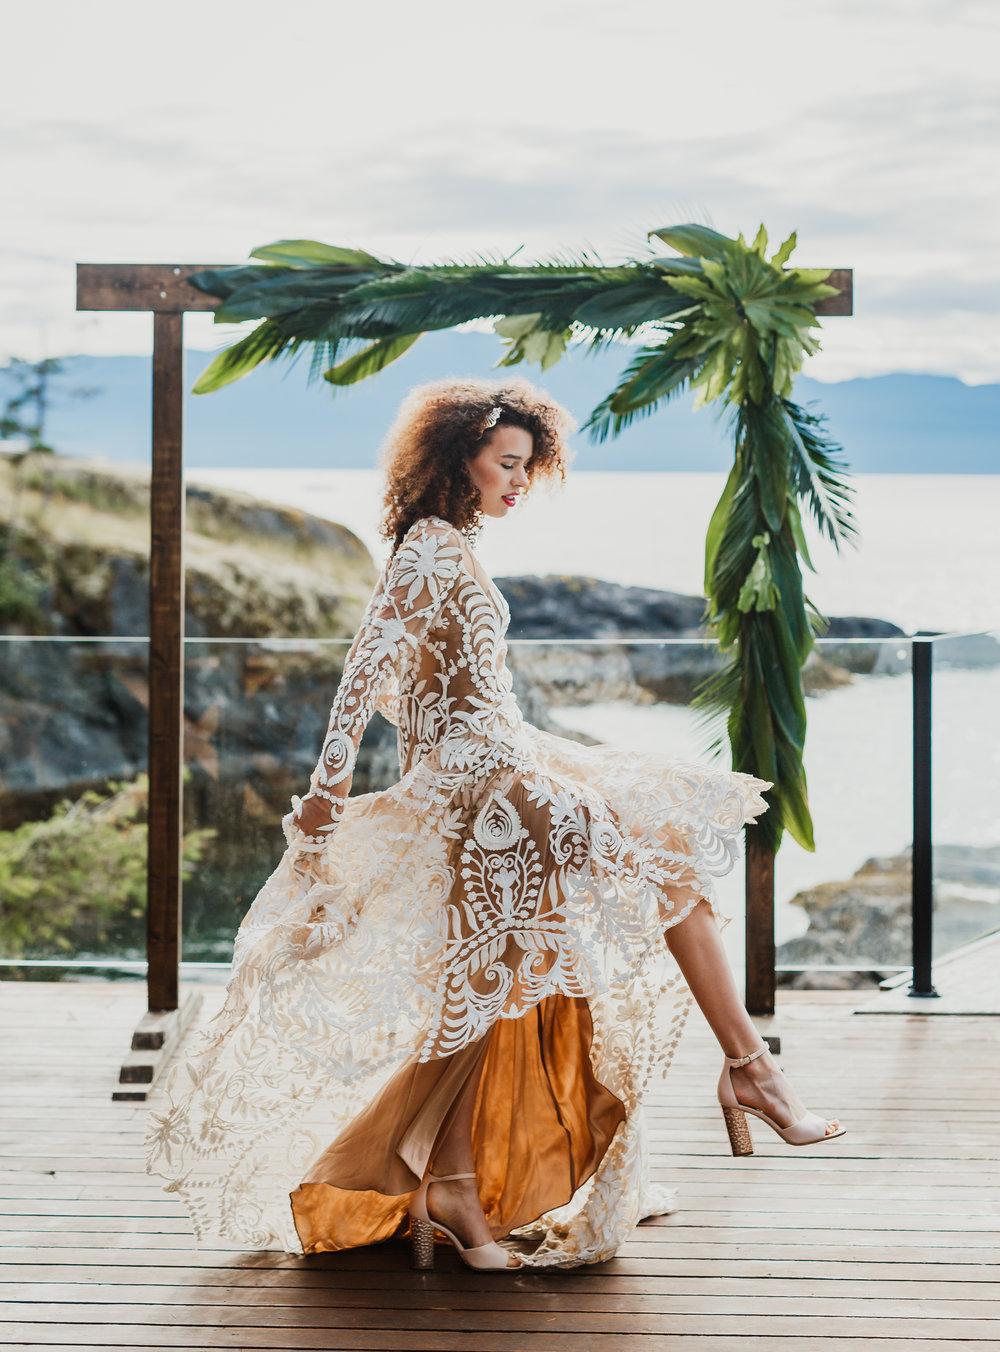 West Coast Bride - Vancouver Wedding Photographer & Videographer - Sunshine Coast Wedding Photos - Sunshine Coast Wedding Photographer - Jennifer Picard Photography - IMG_7606.jpg